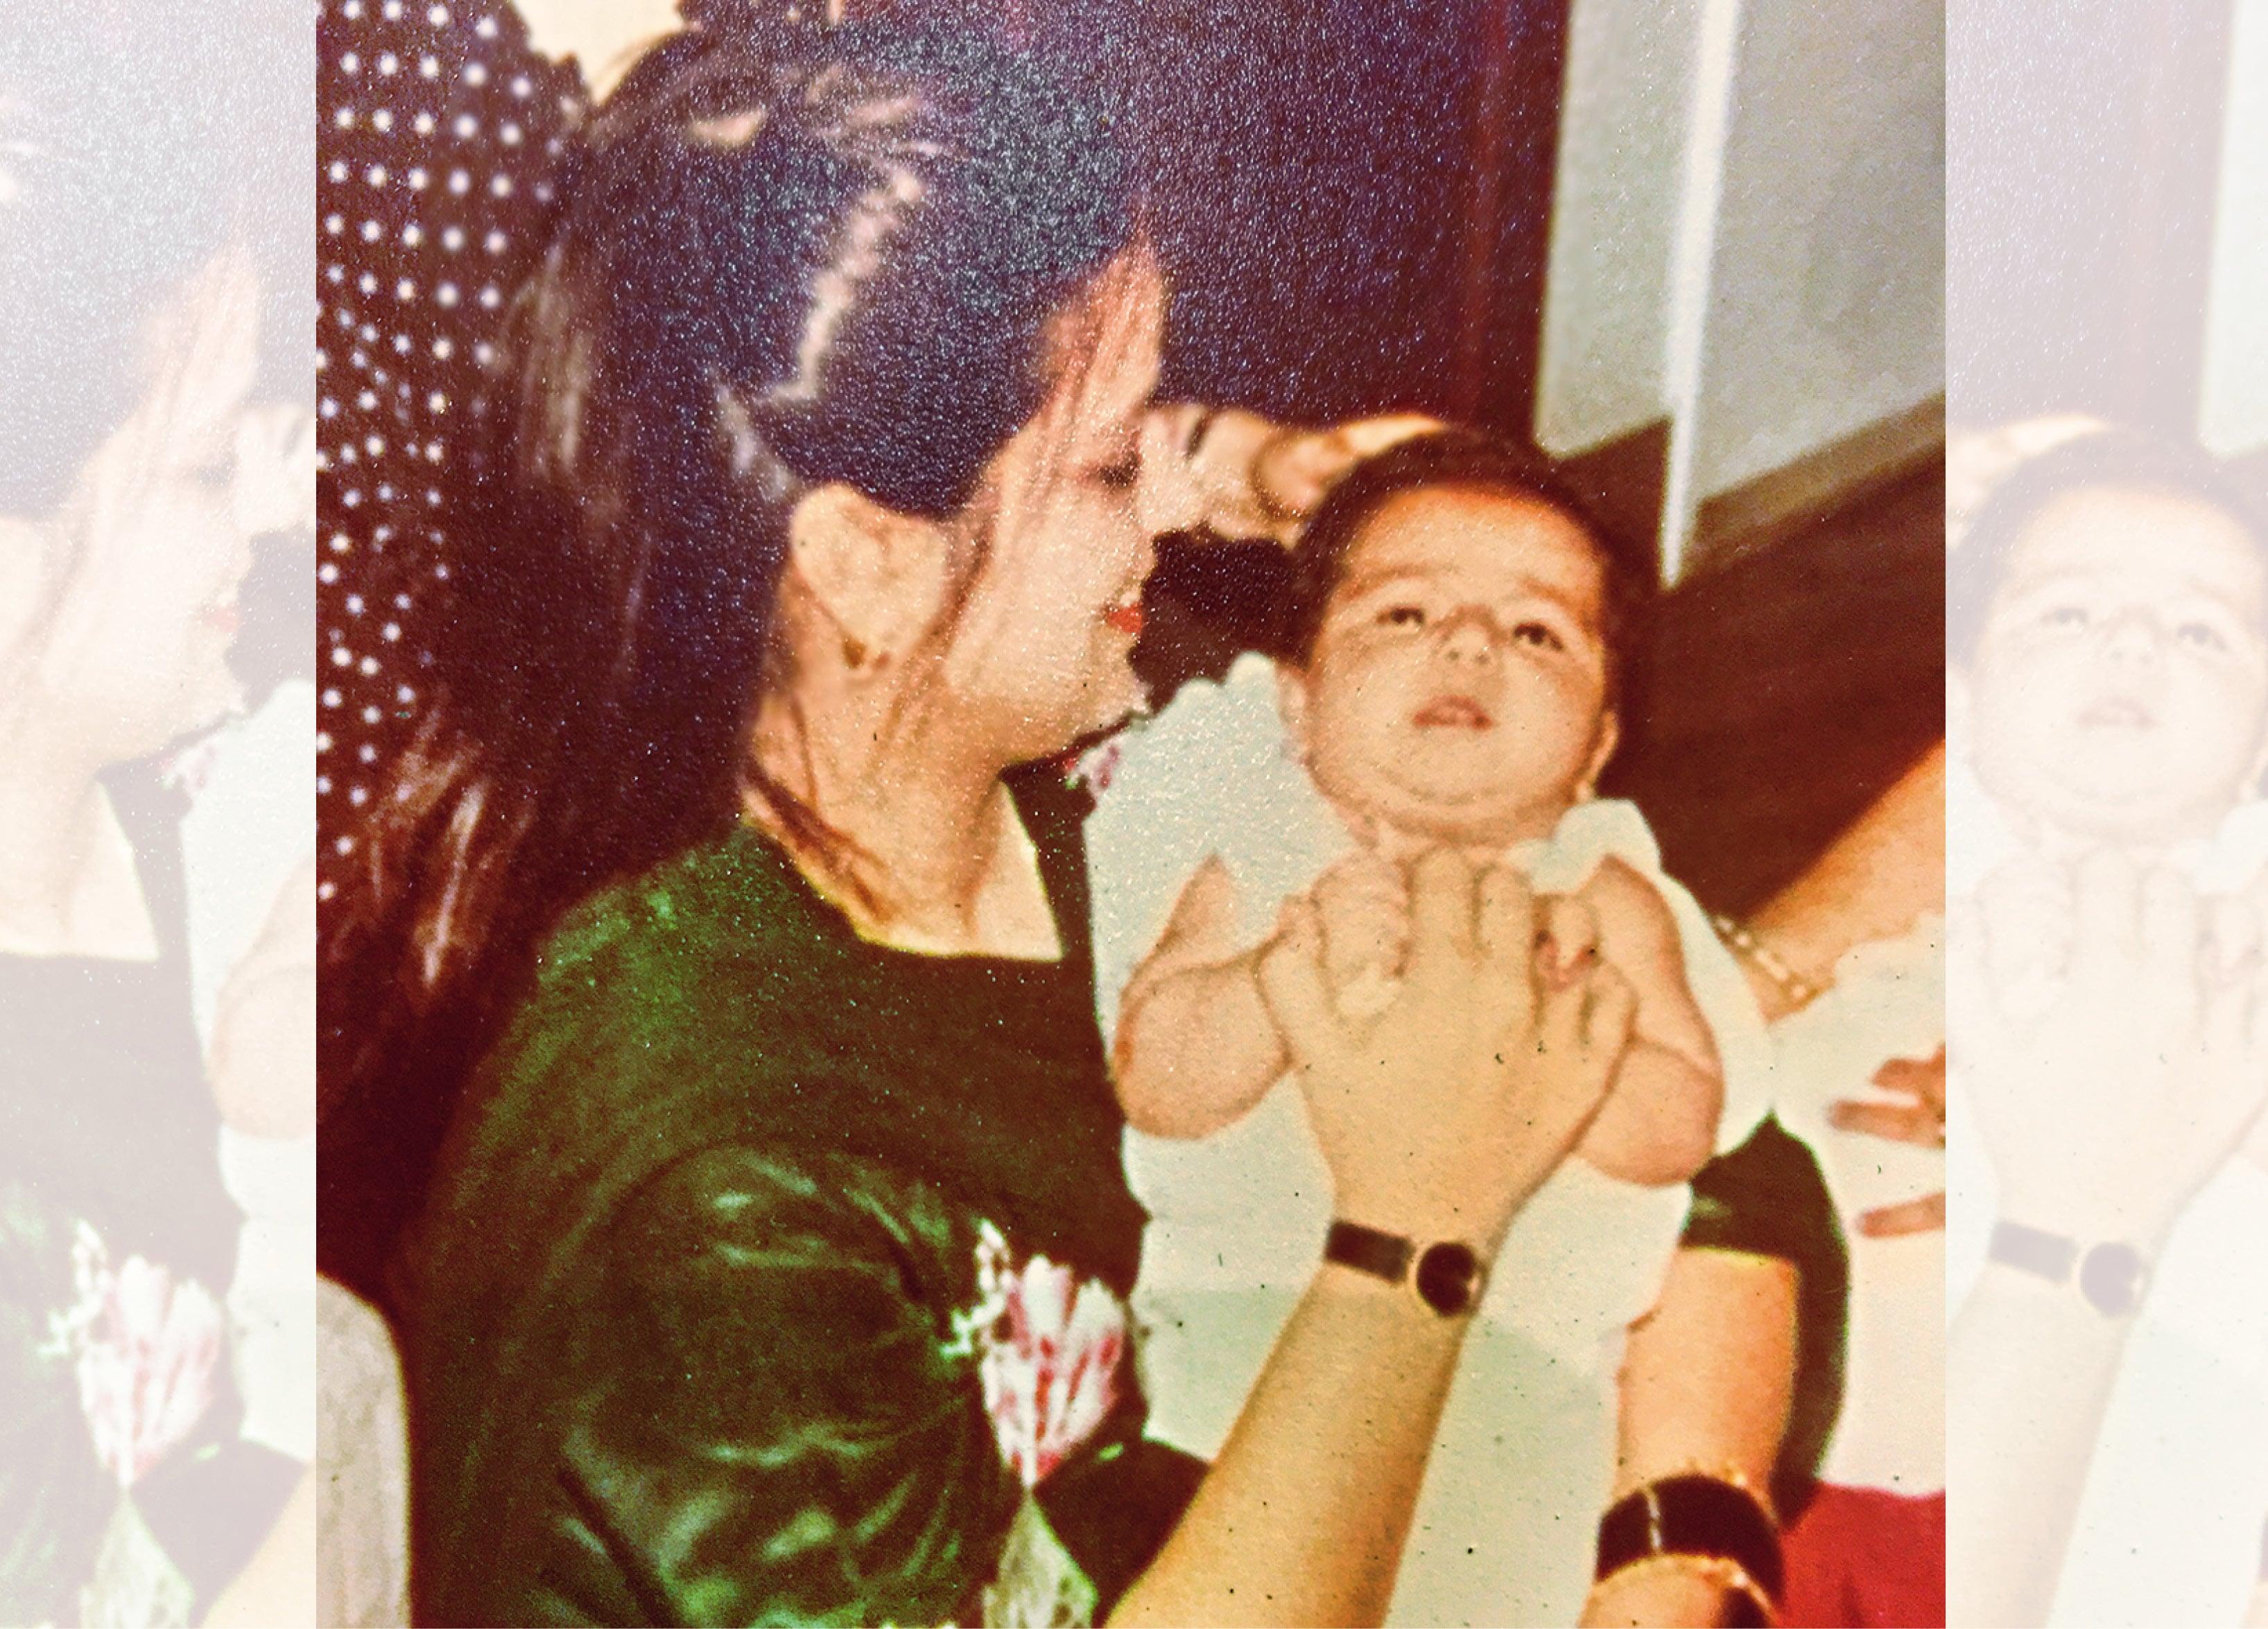 With her newborn baby, Siddharth